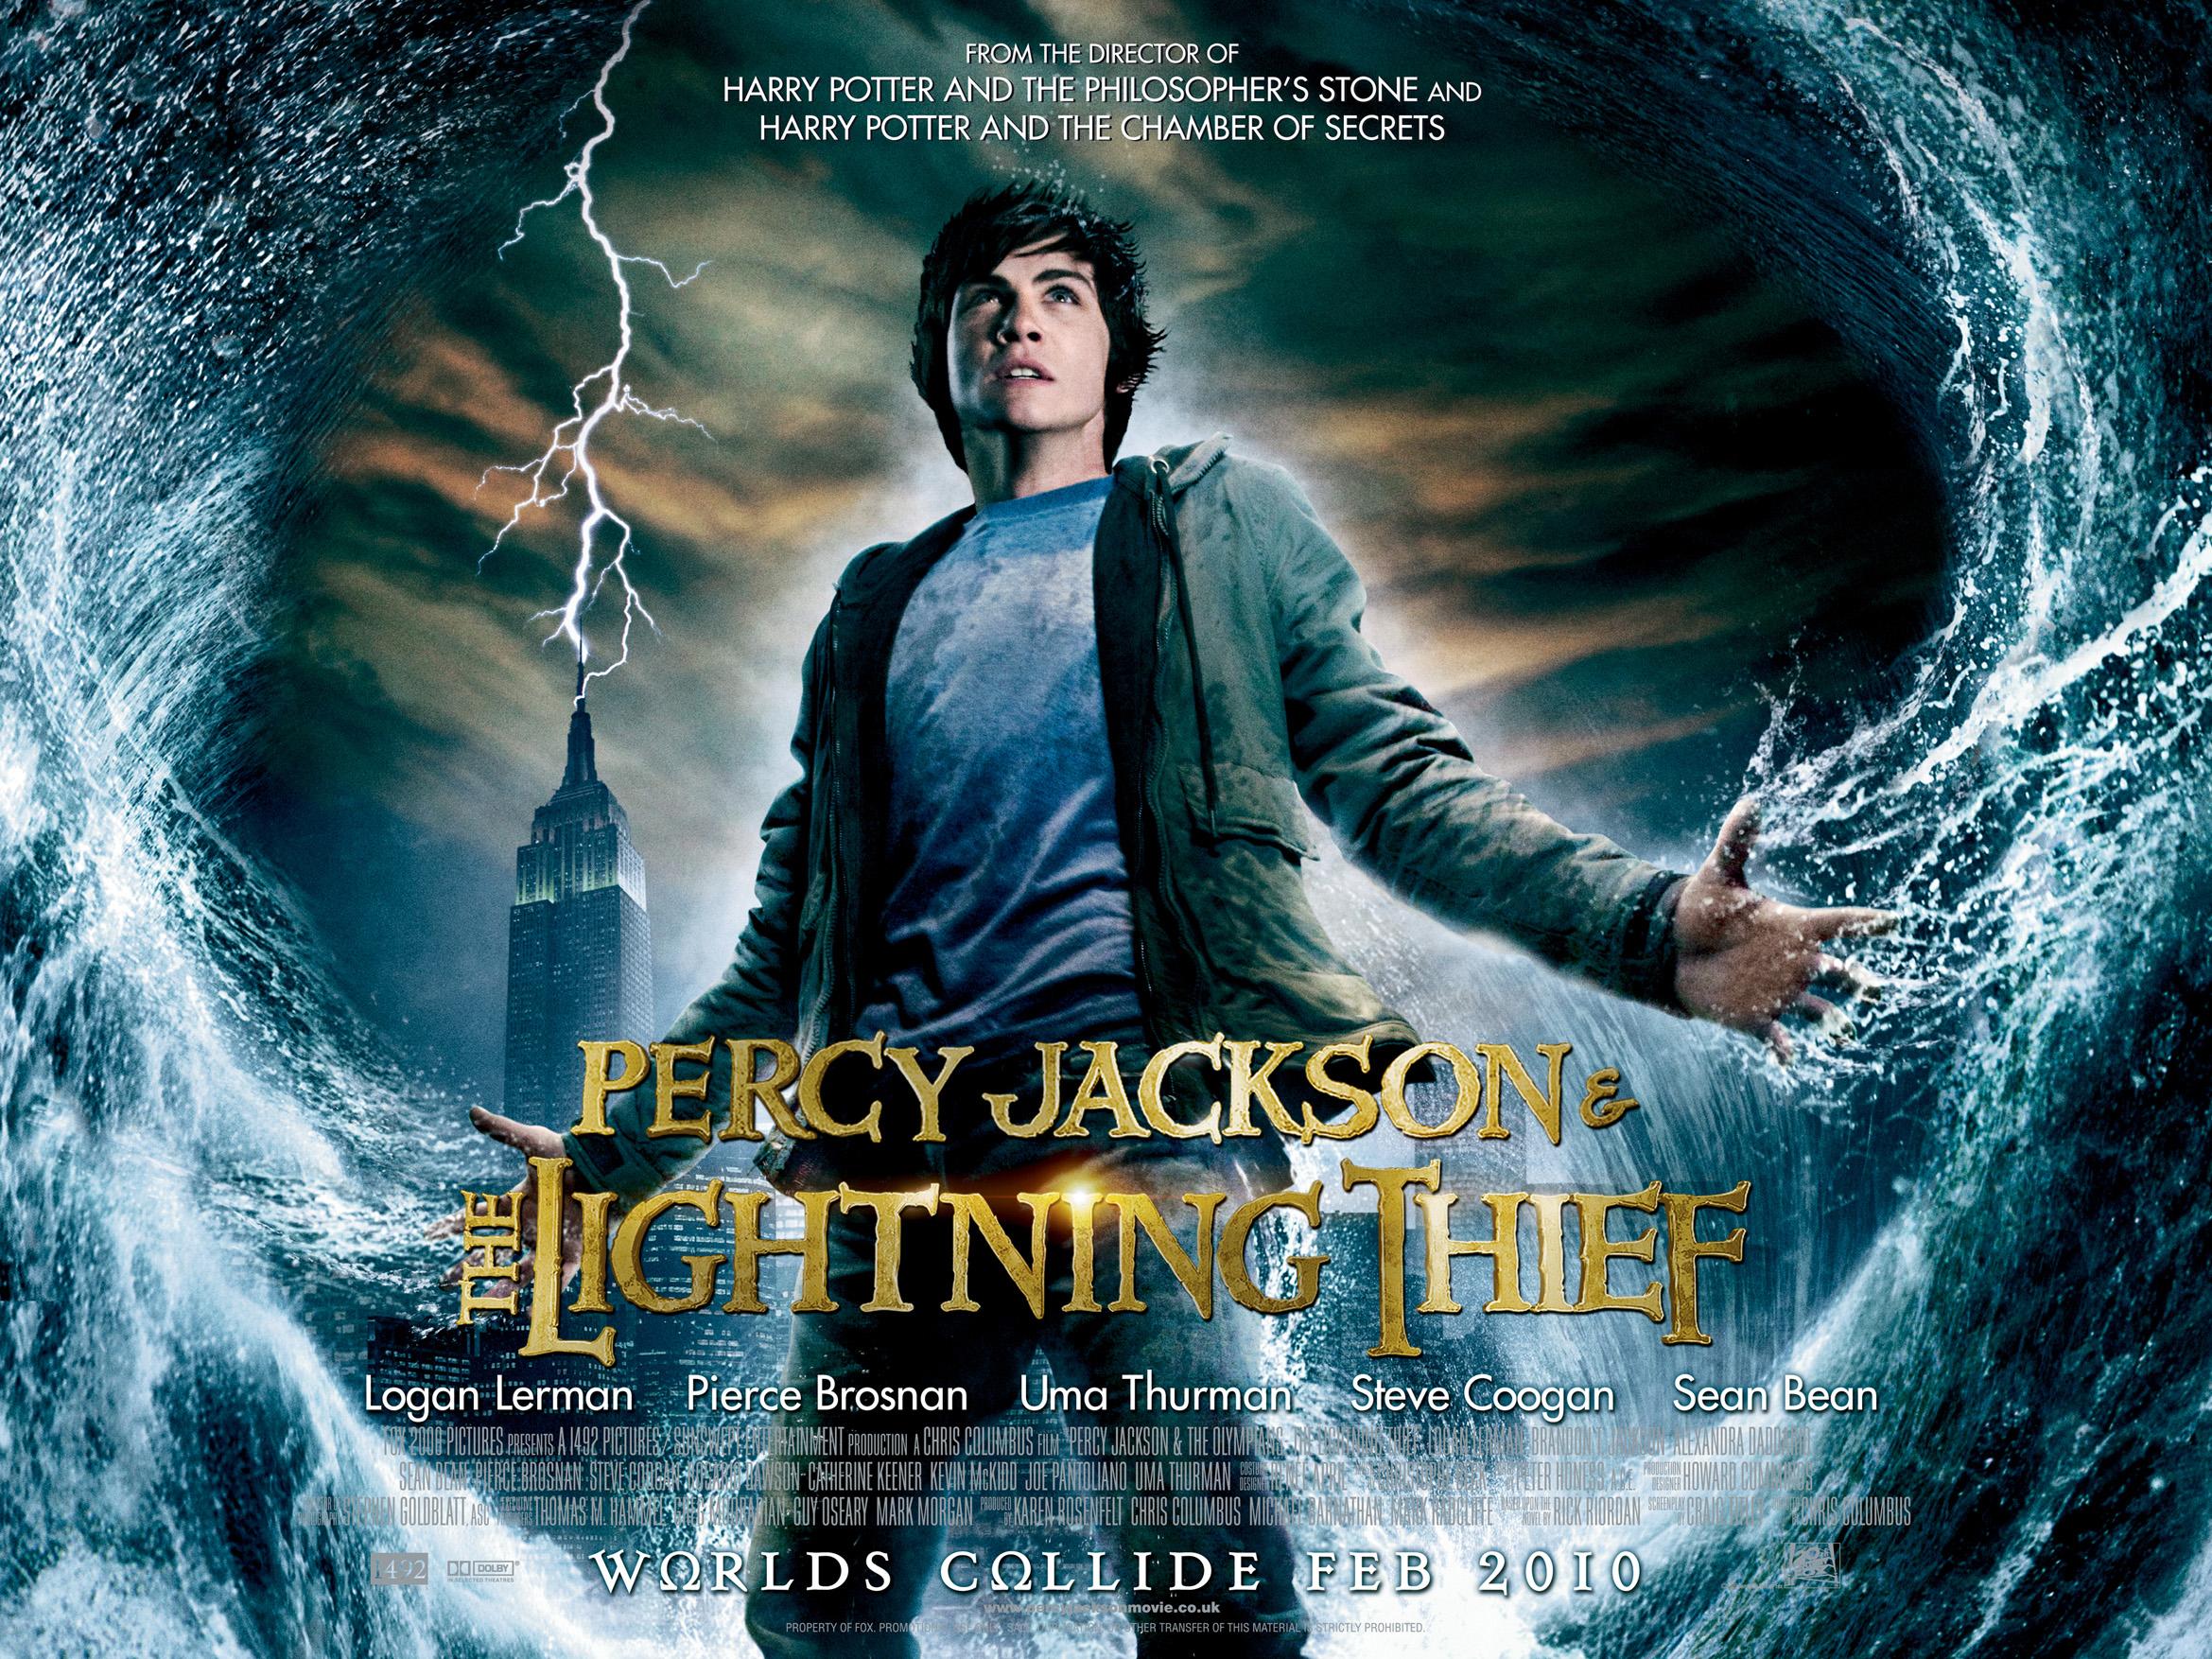 KẺ CẮP TIA CHỚP Percy Jackson & the Olympians: The Lightning Thief (2010)